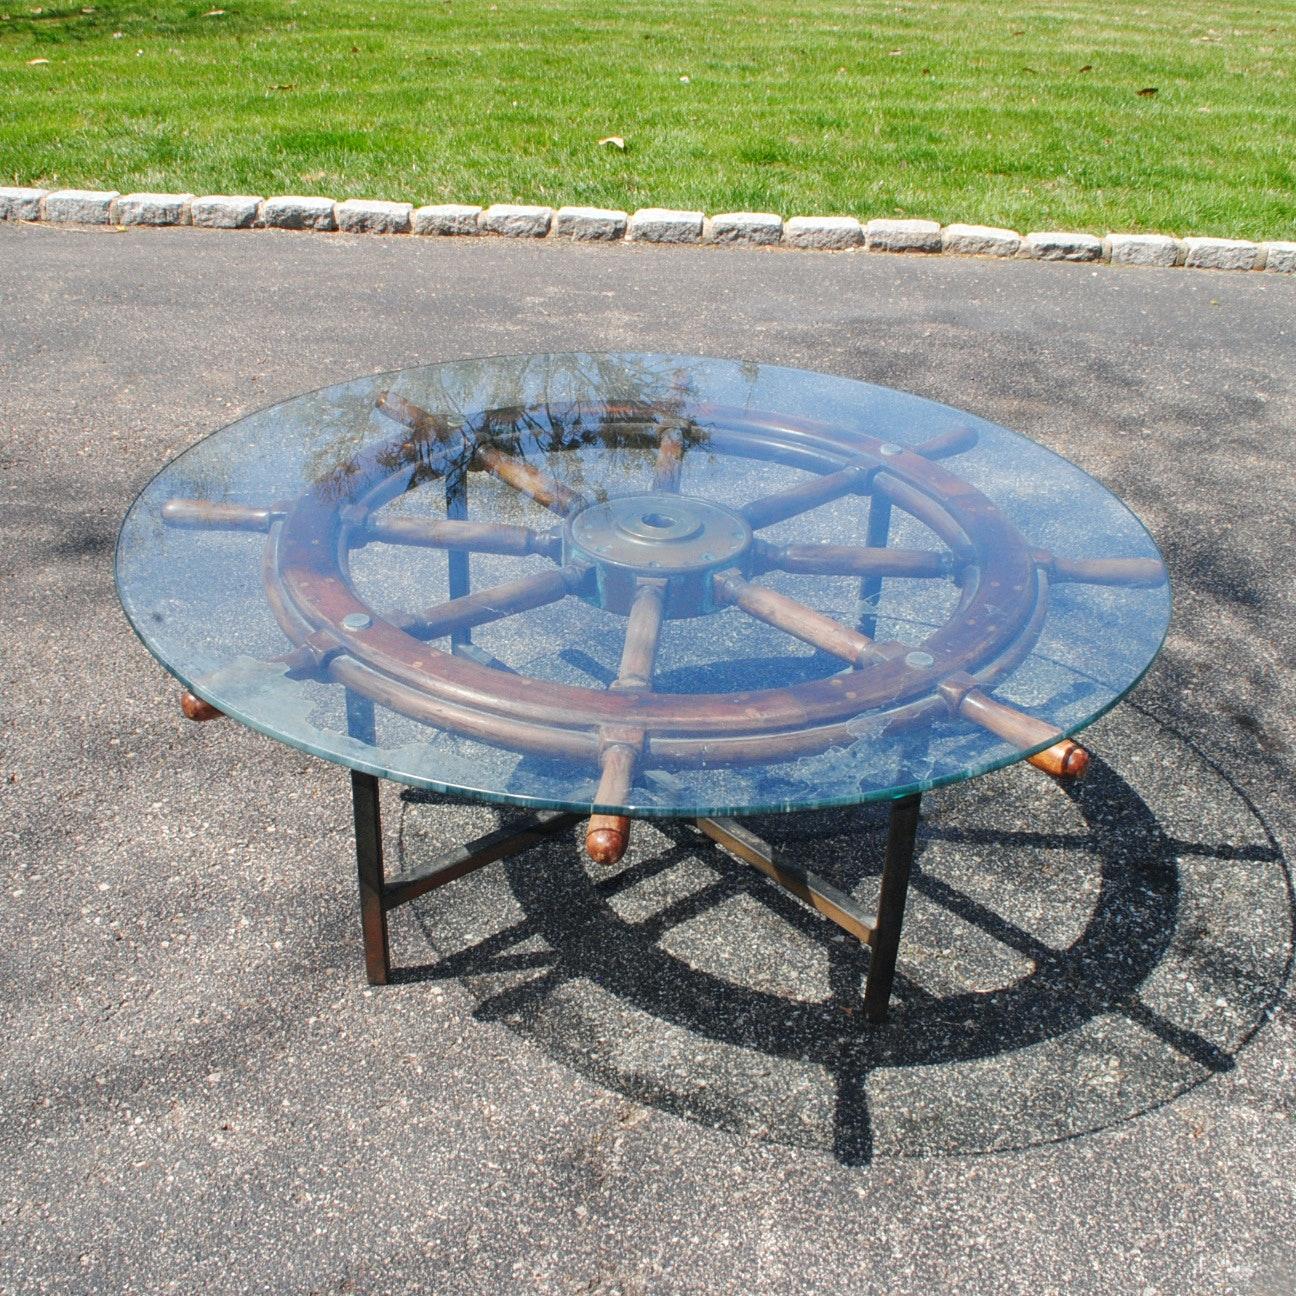 Glass Topped Shipu0027s Wheel Coffee Table ...